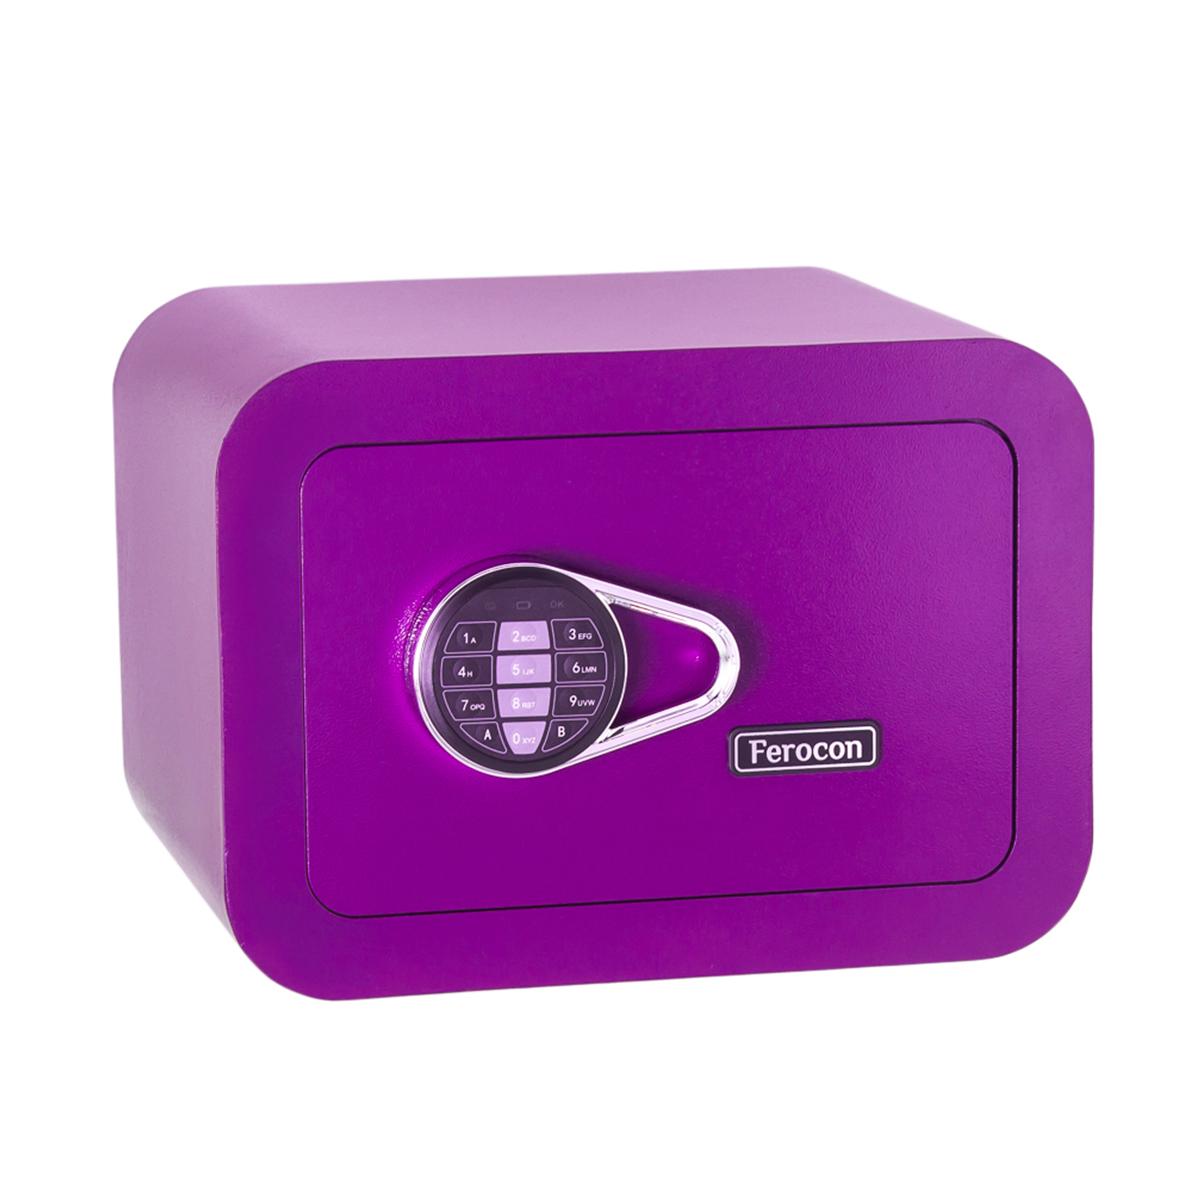 Сейф Ferocon Energy Violet